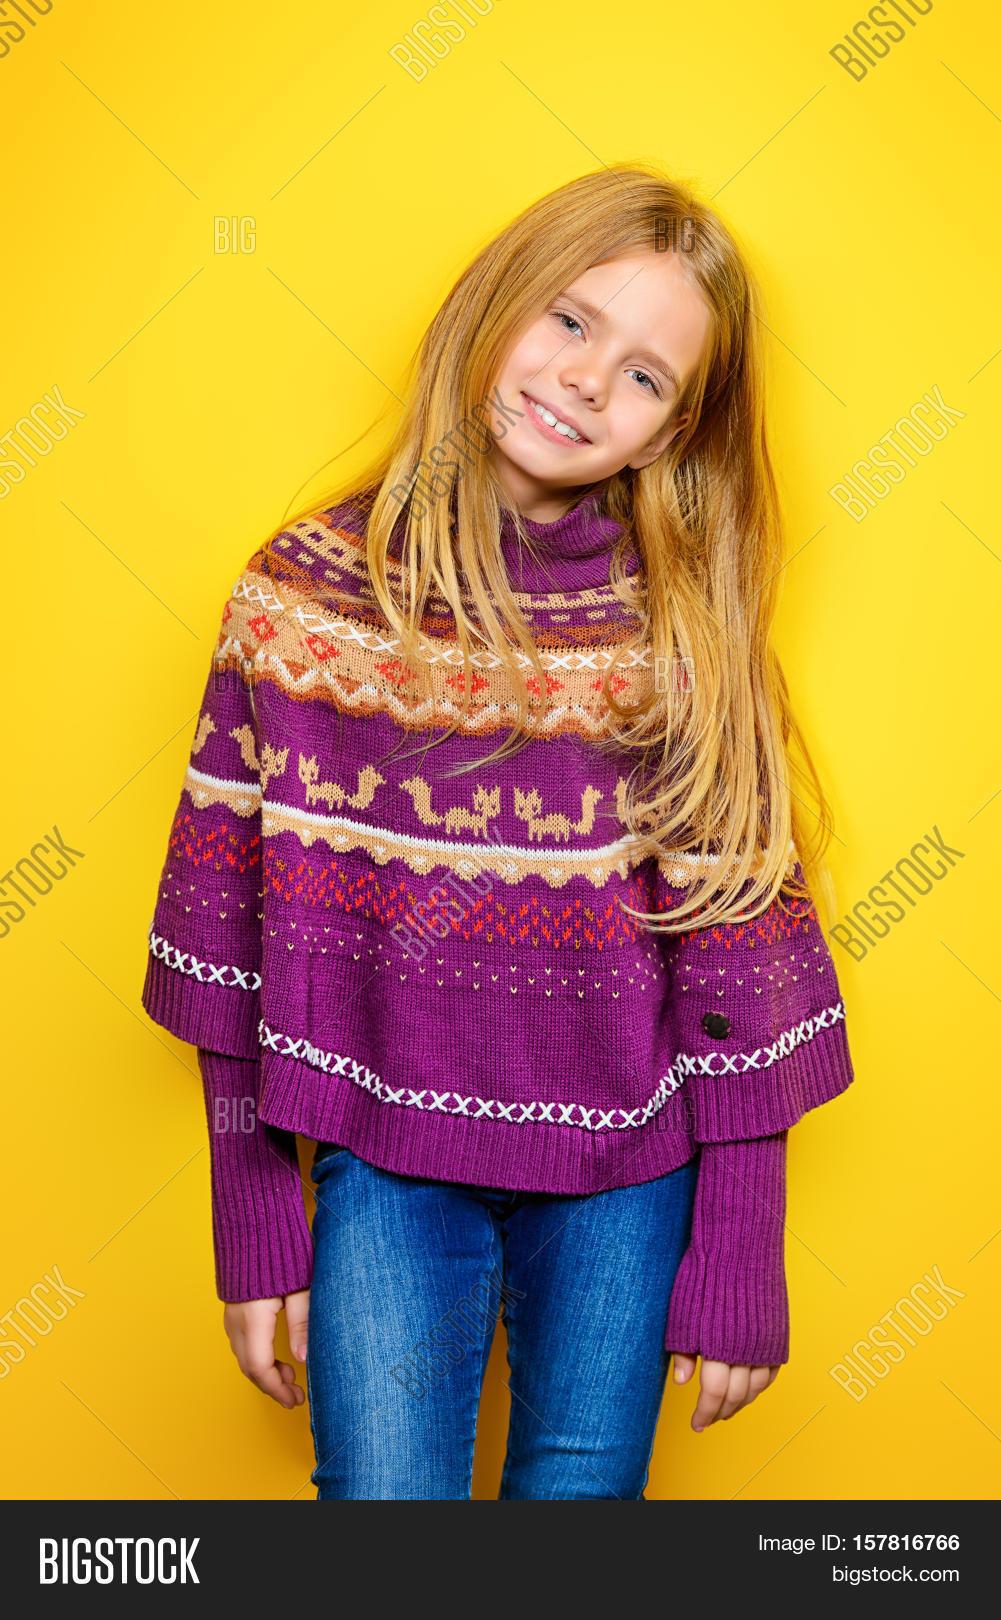 Kid's Fashion. Image & Photo (Free Trial) | Bigstock